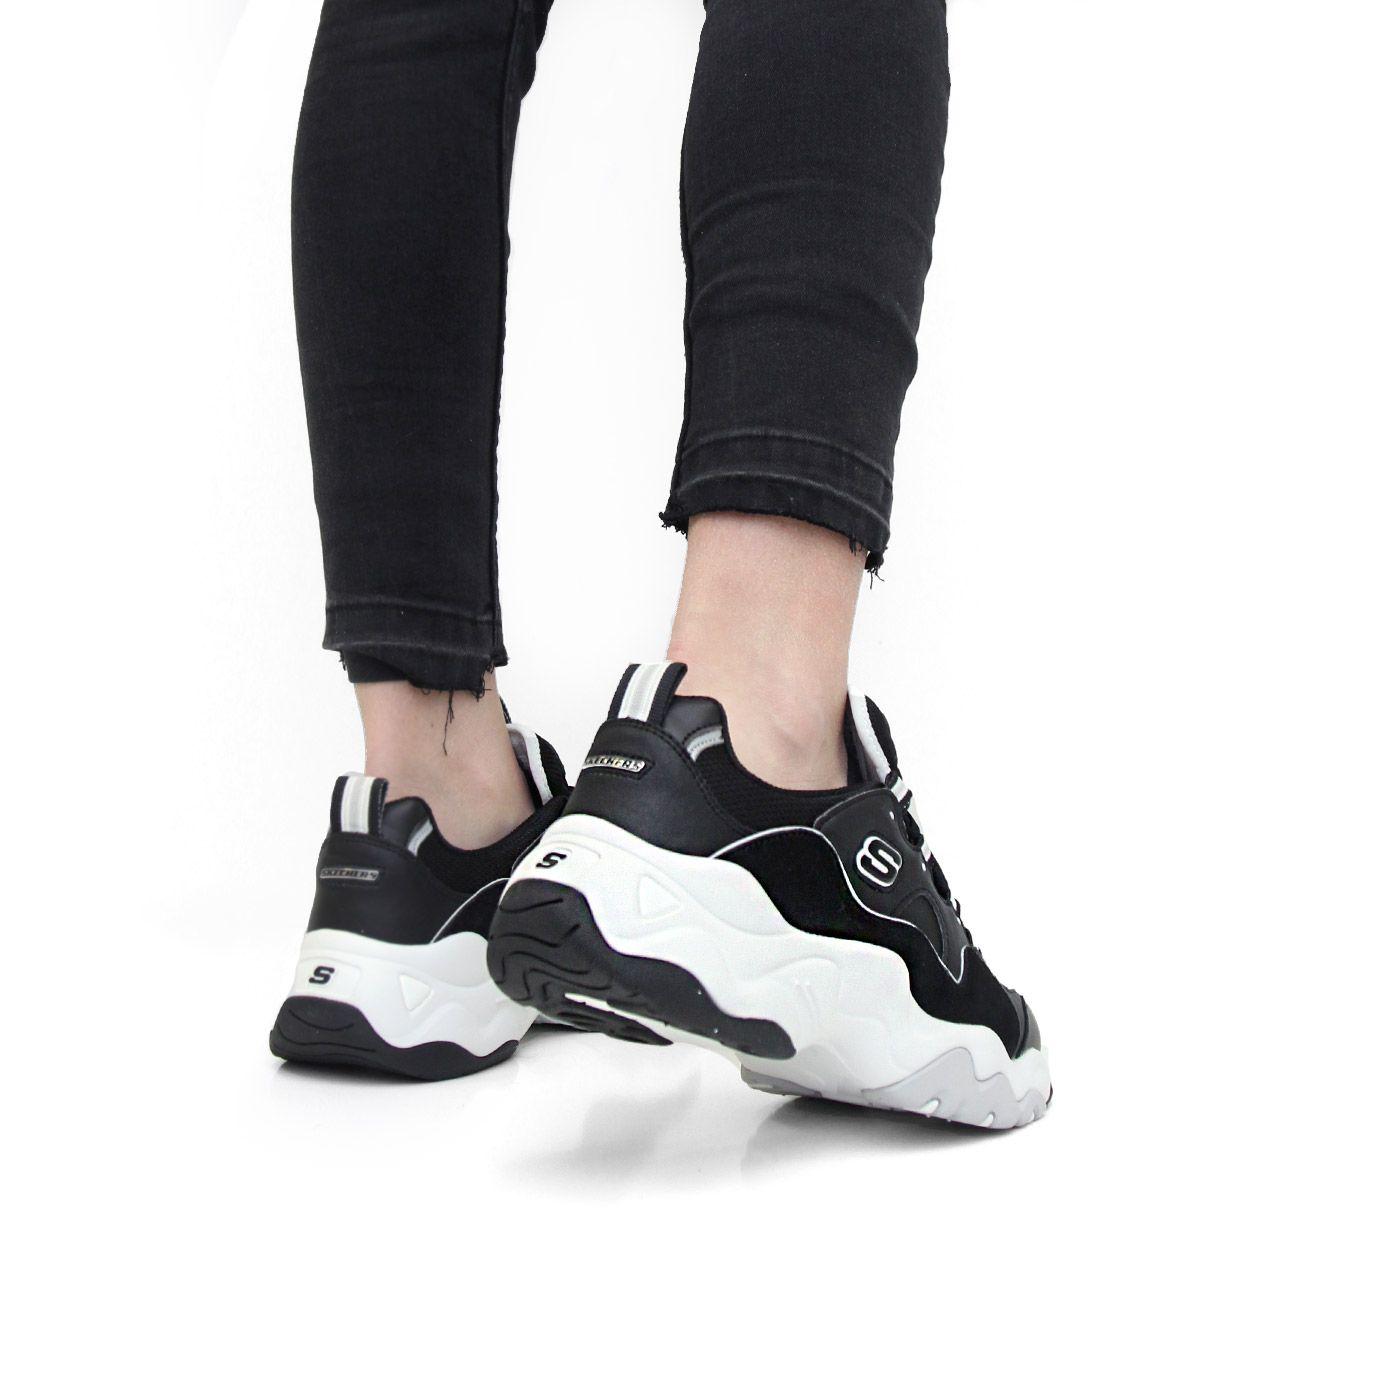 zapatos skechers hombre negro womens